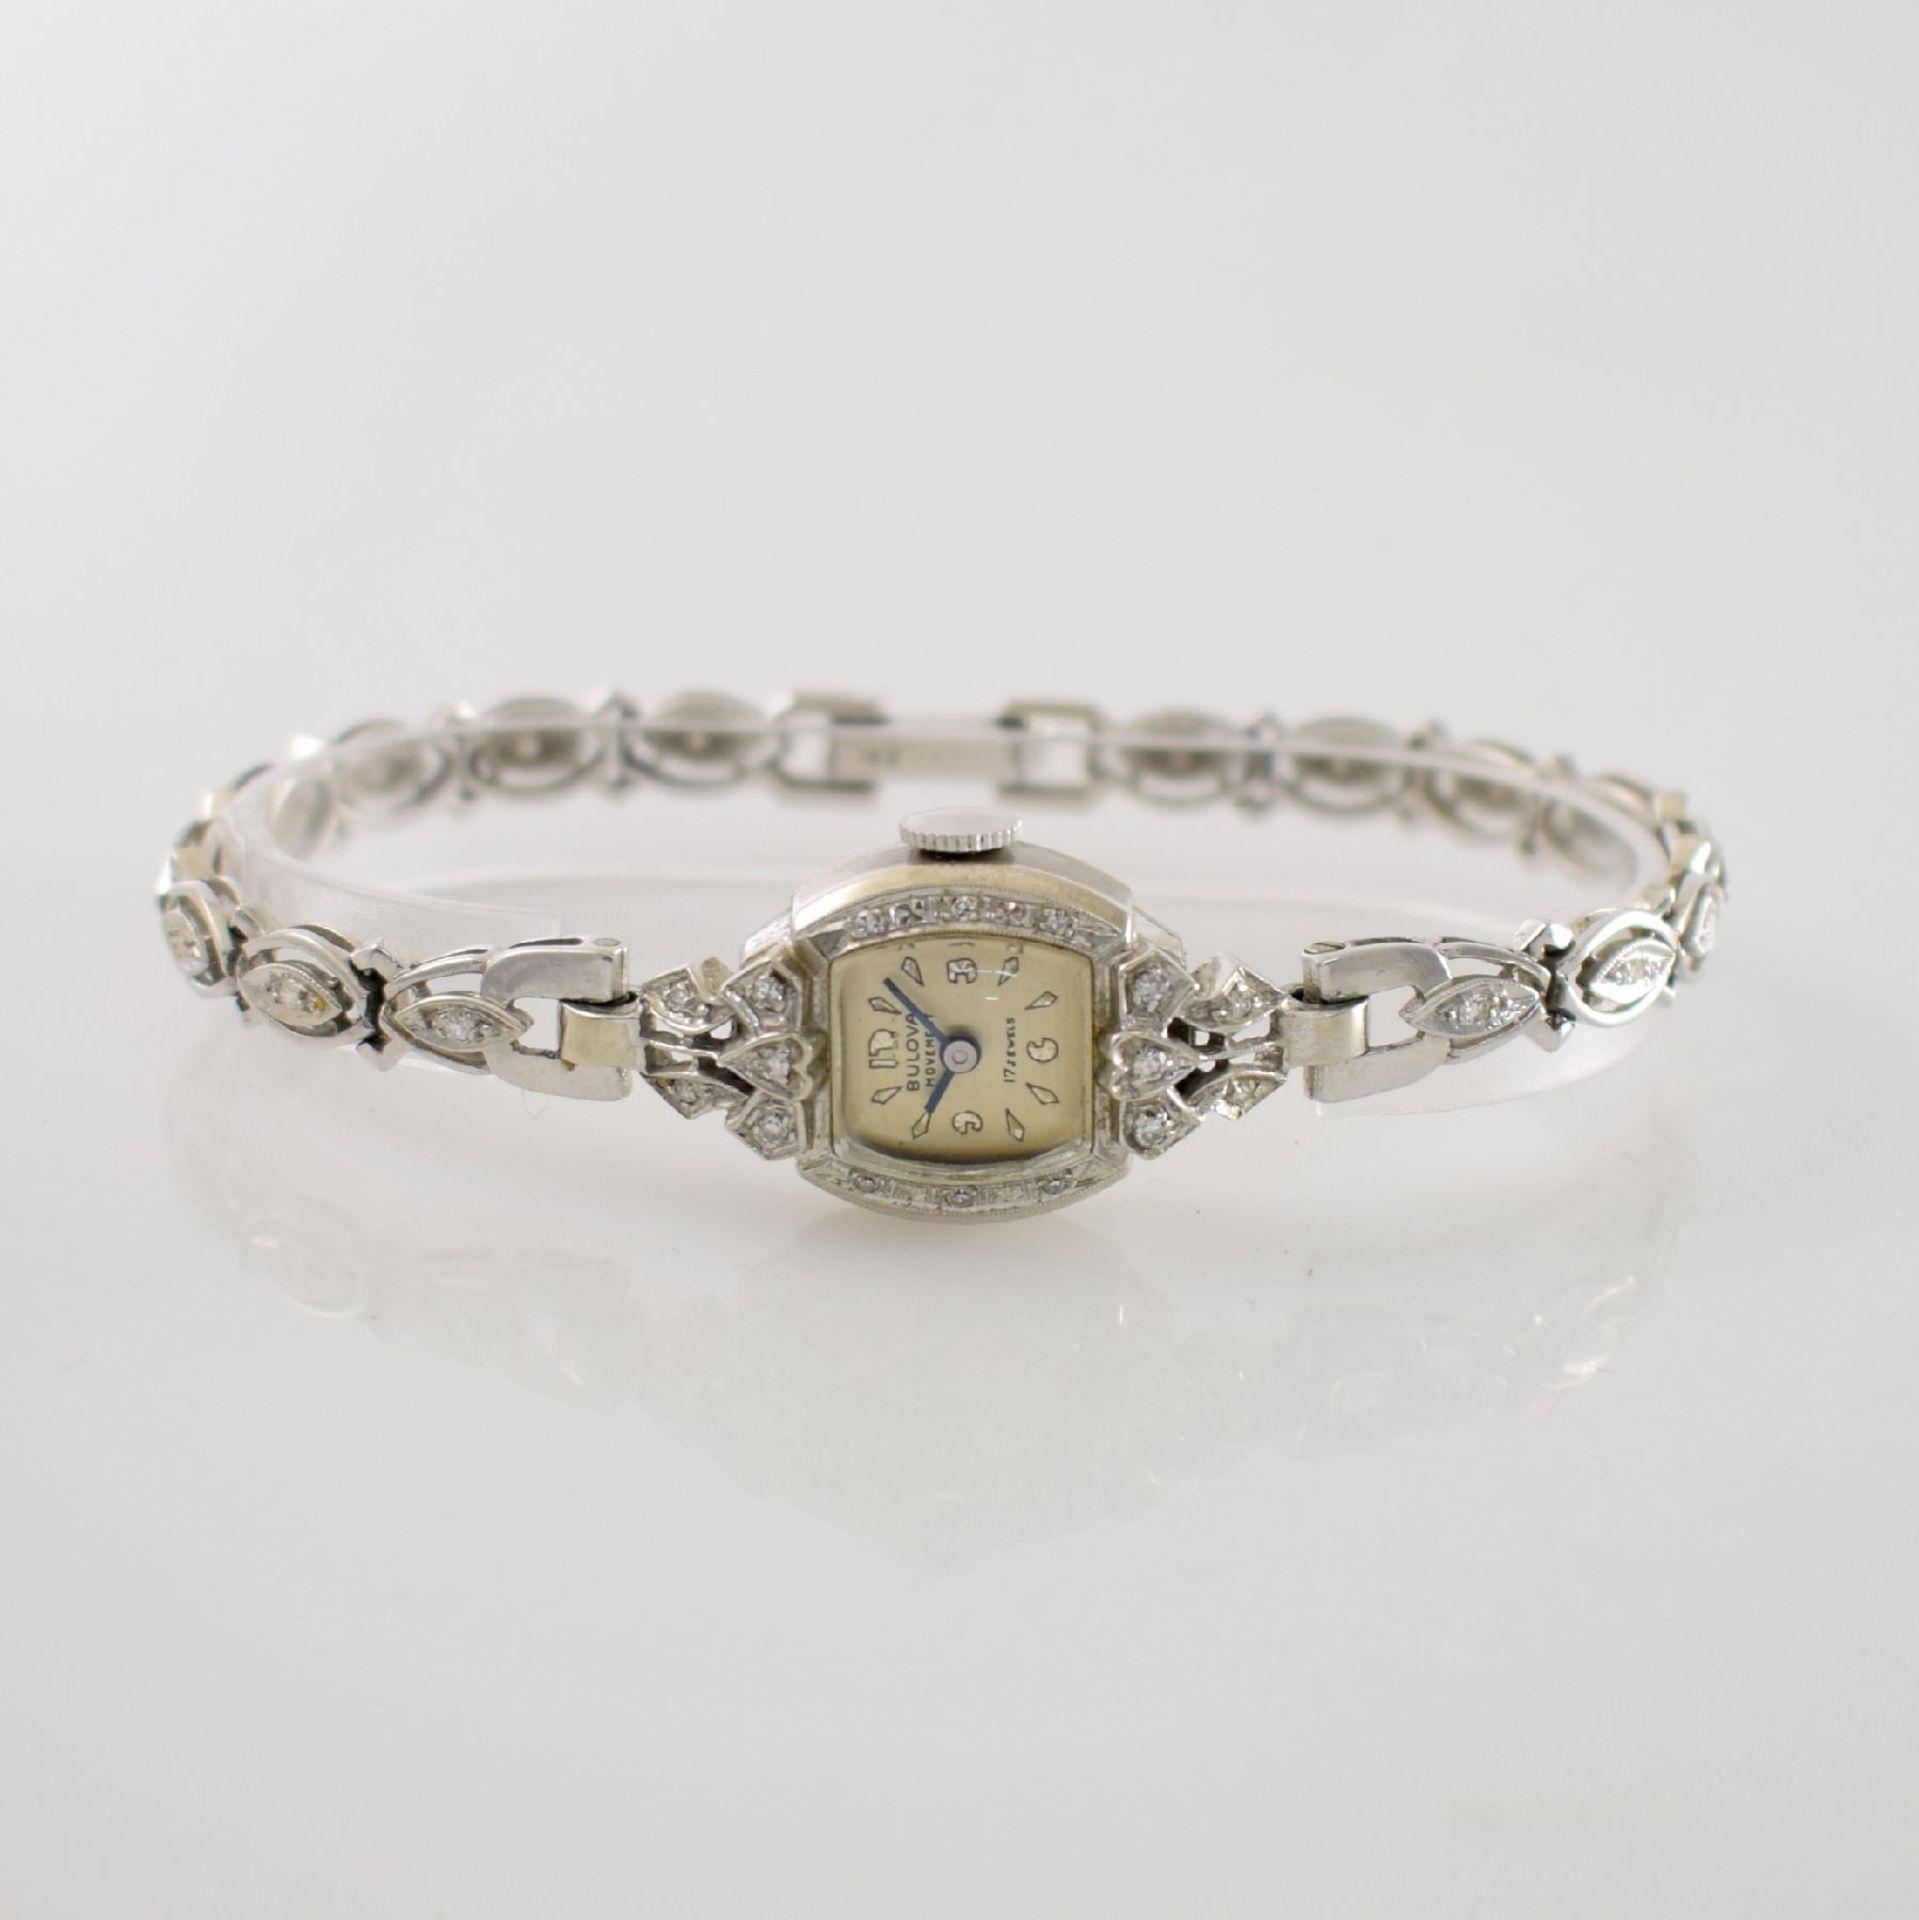 BULOVA Damenarmbanduhr in WG 585/000 mit Diamantbesatz, Handaufzug, USA um 1940, Boden aufgedr.,